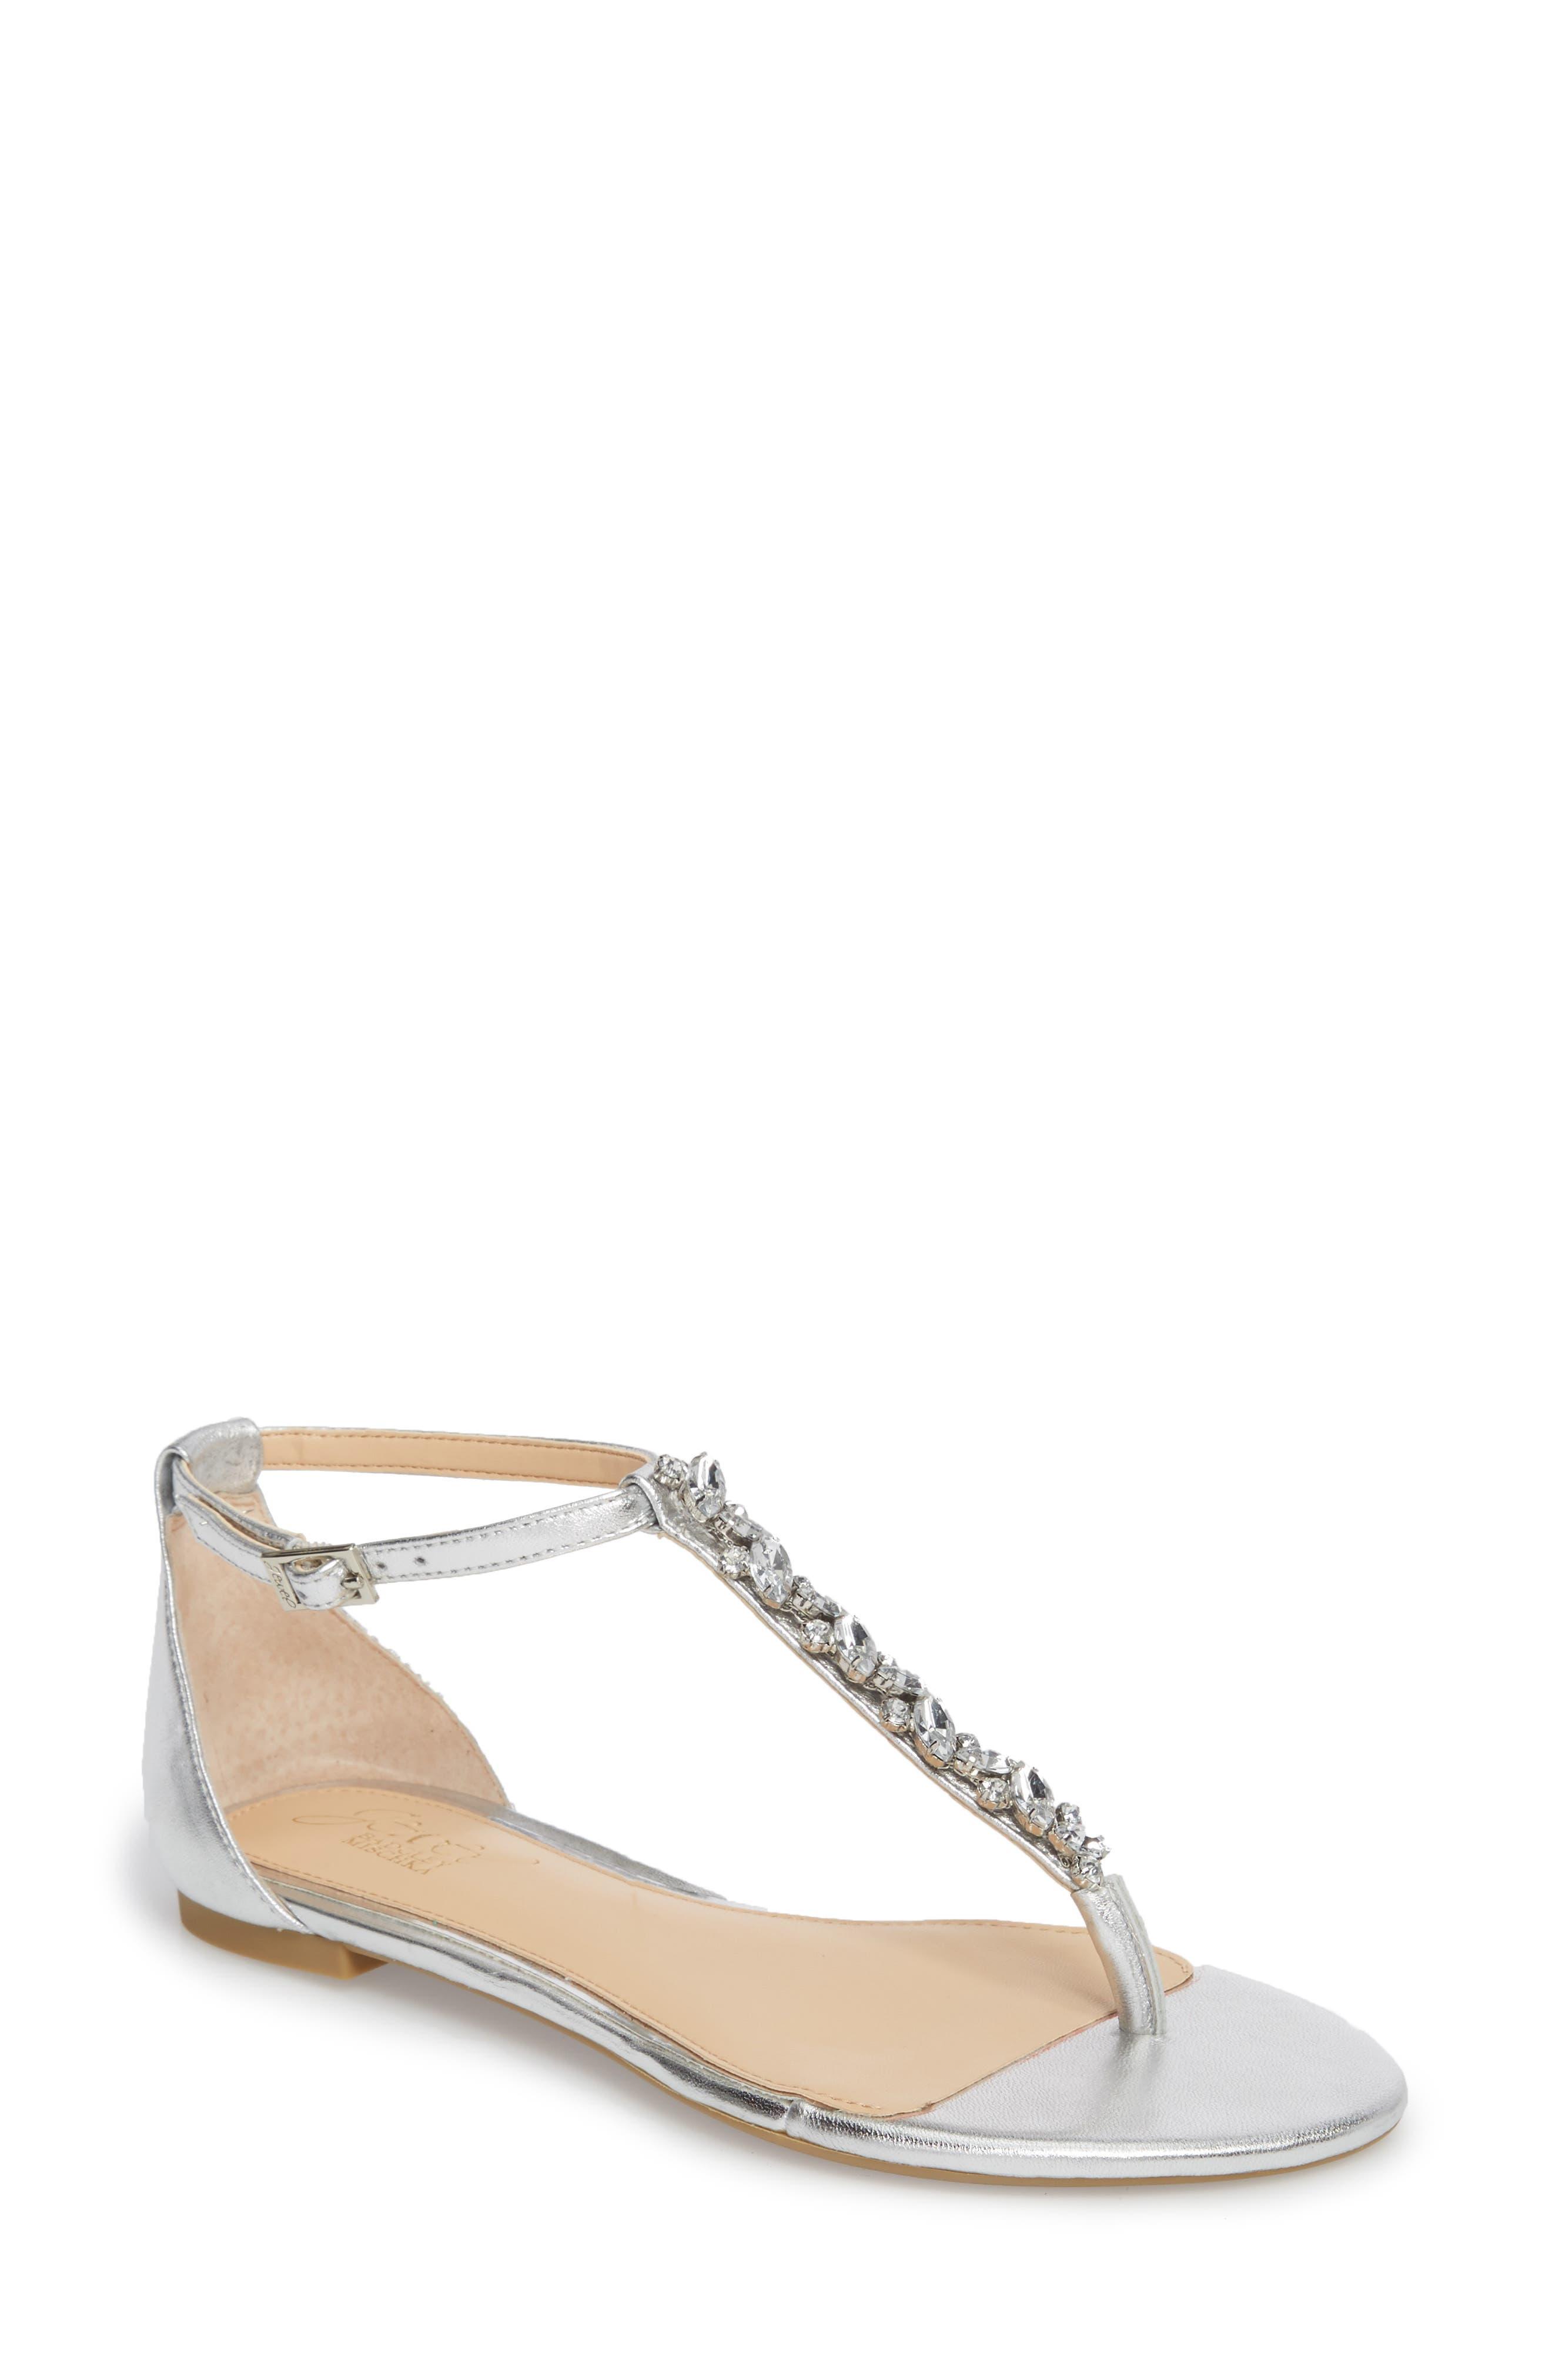 Jewel Badgley Mischka Carrol Embellished T-Strap Sandal (Women)